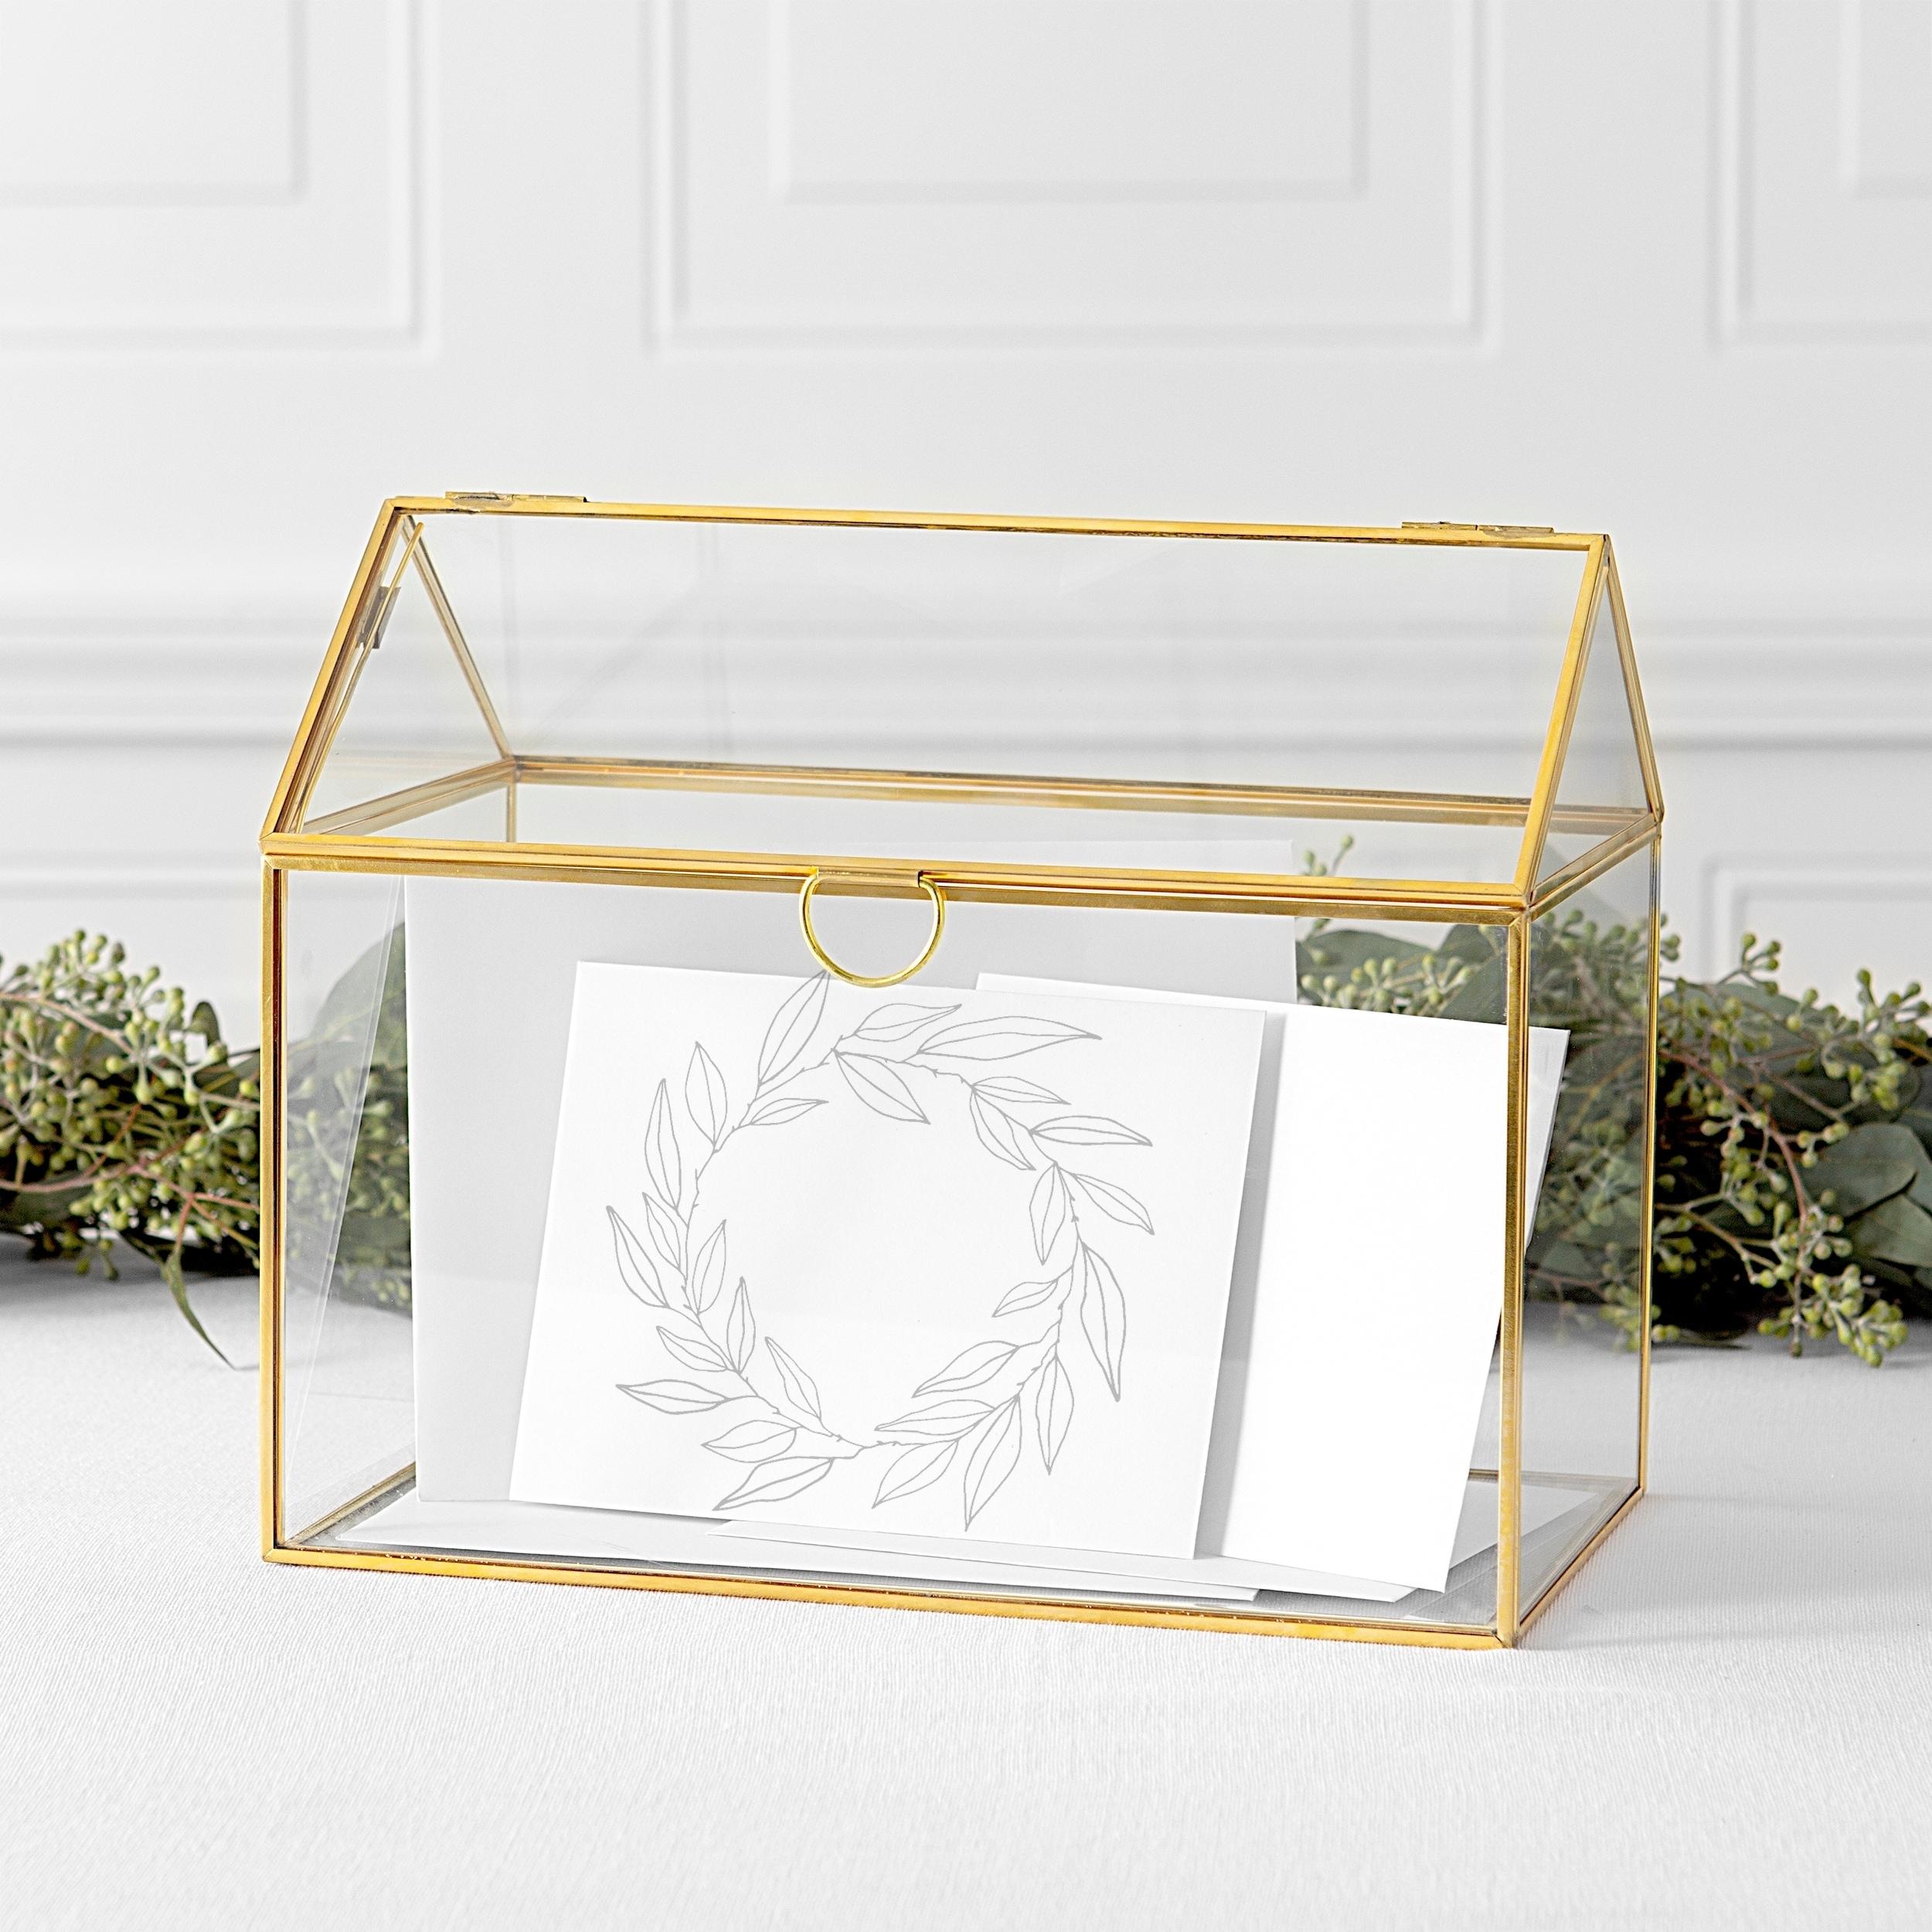 Shop Gold Wreath Glass Terrarium Reception Gift Card Holder Free